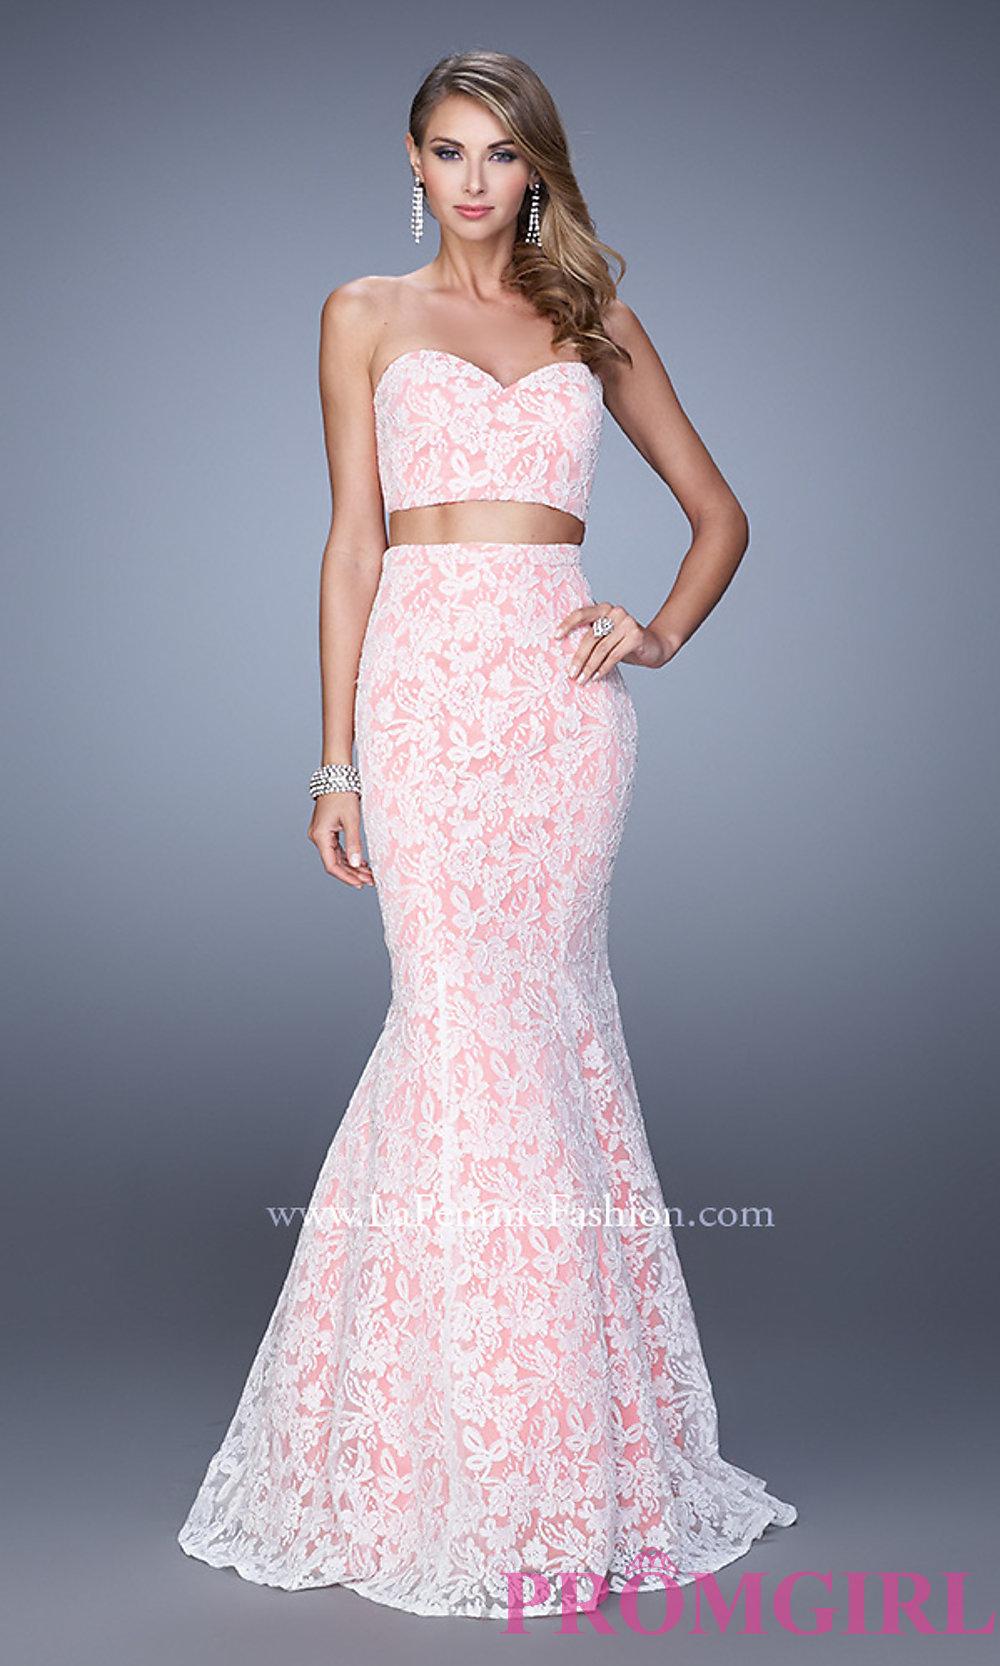 Piece La Femme Lace Prom Dress 21096